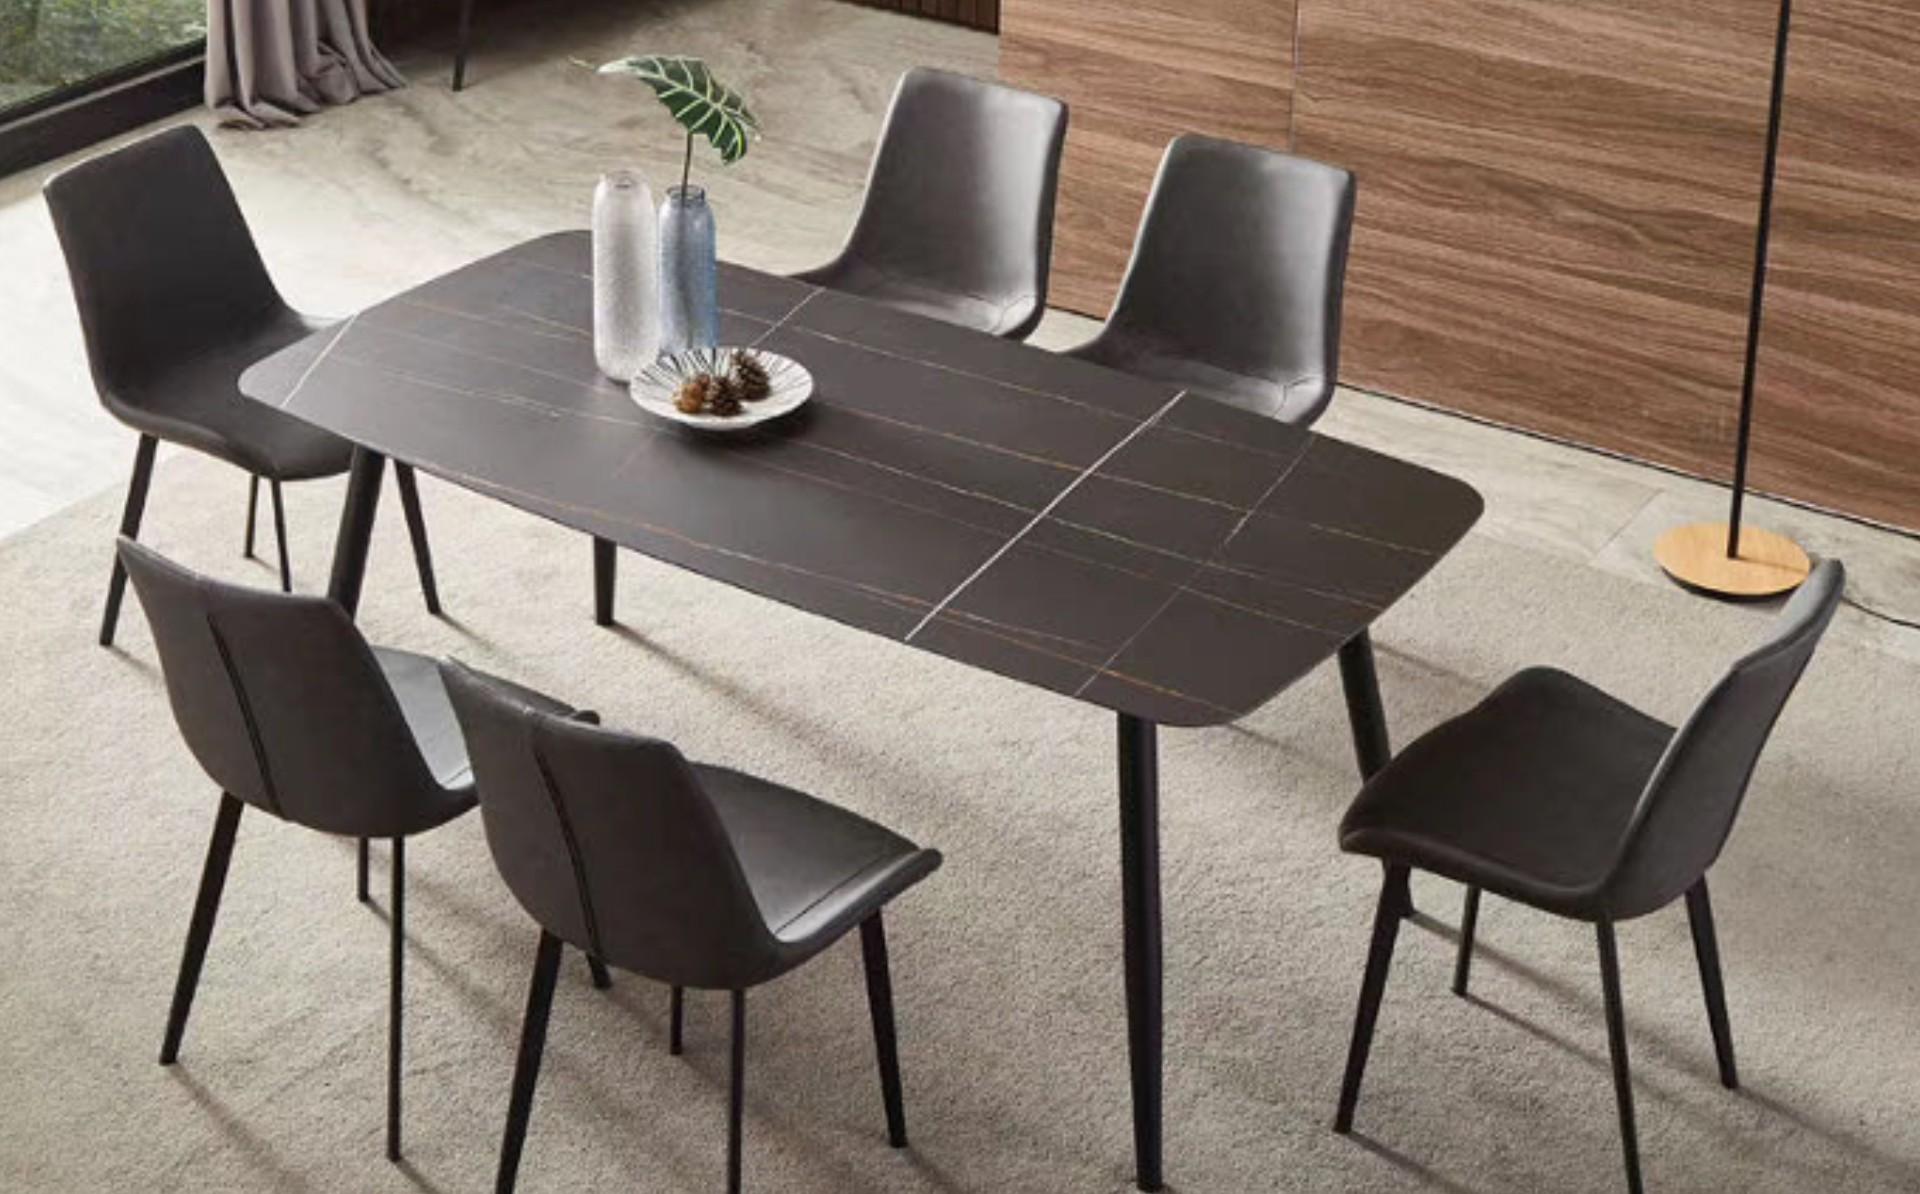 <b>意式轻奢岩板餐桌</b>